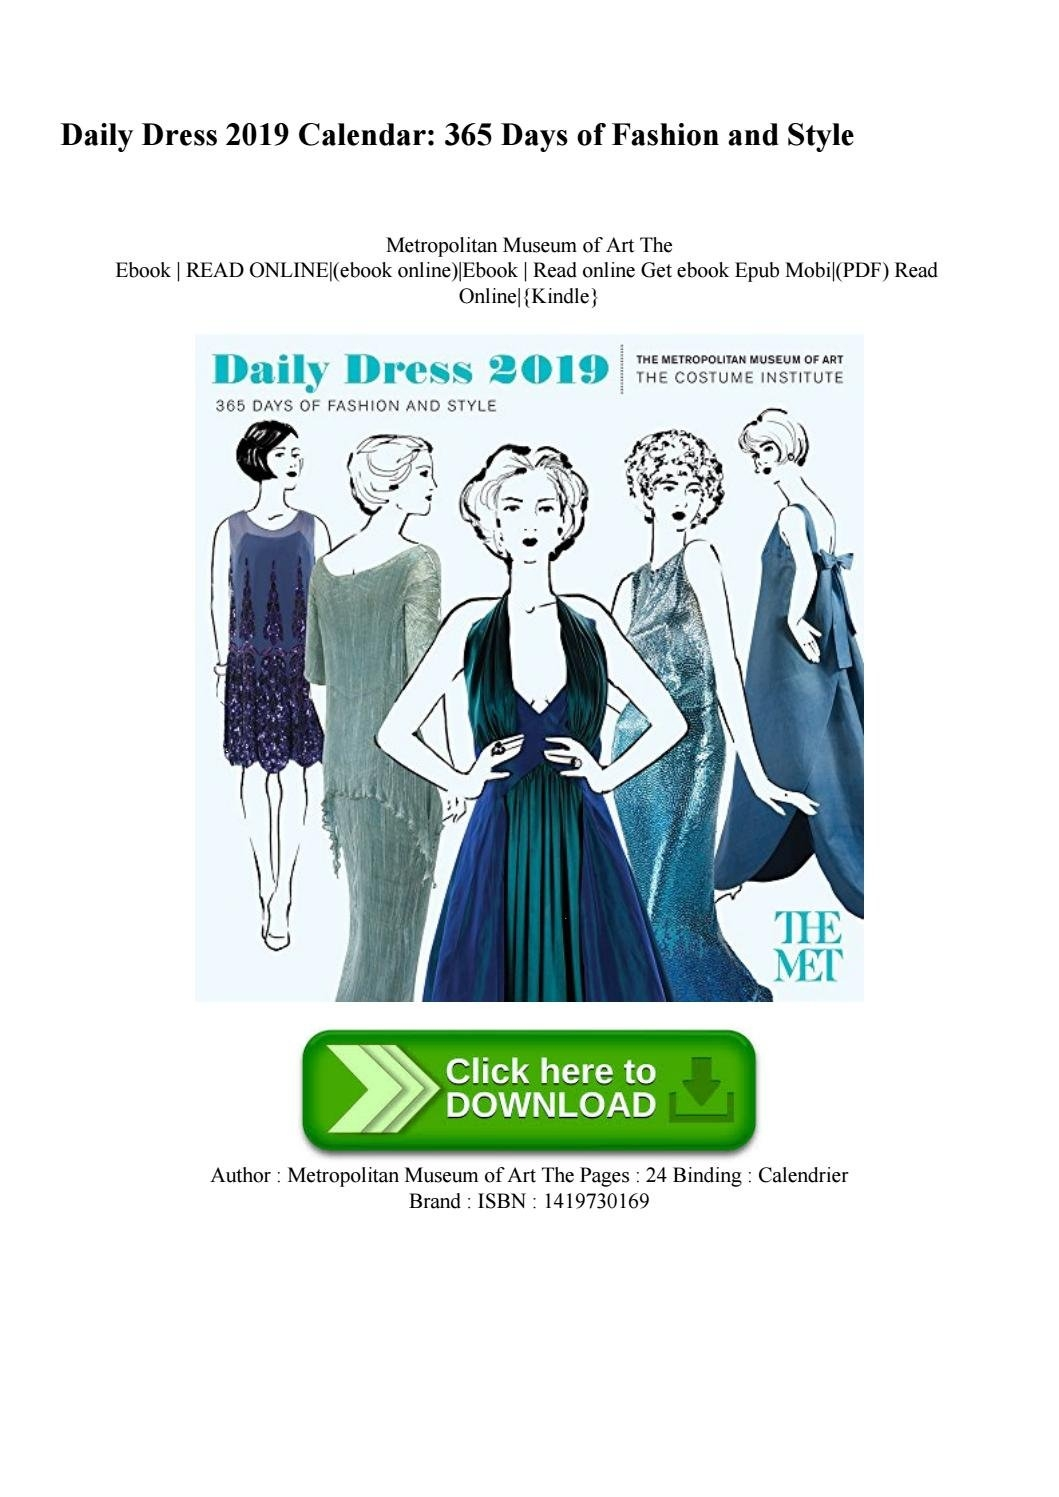 Pdf) Daily Dress 2019 Calendar 365 Days Of Fashion And Style Free 2019 Calendar 365 Pdf